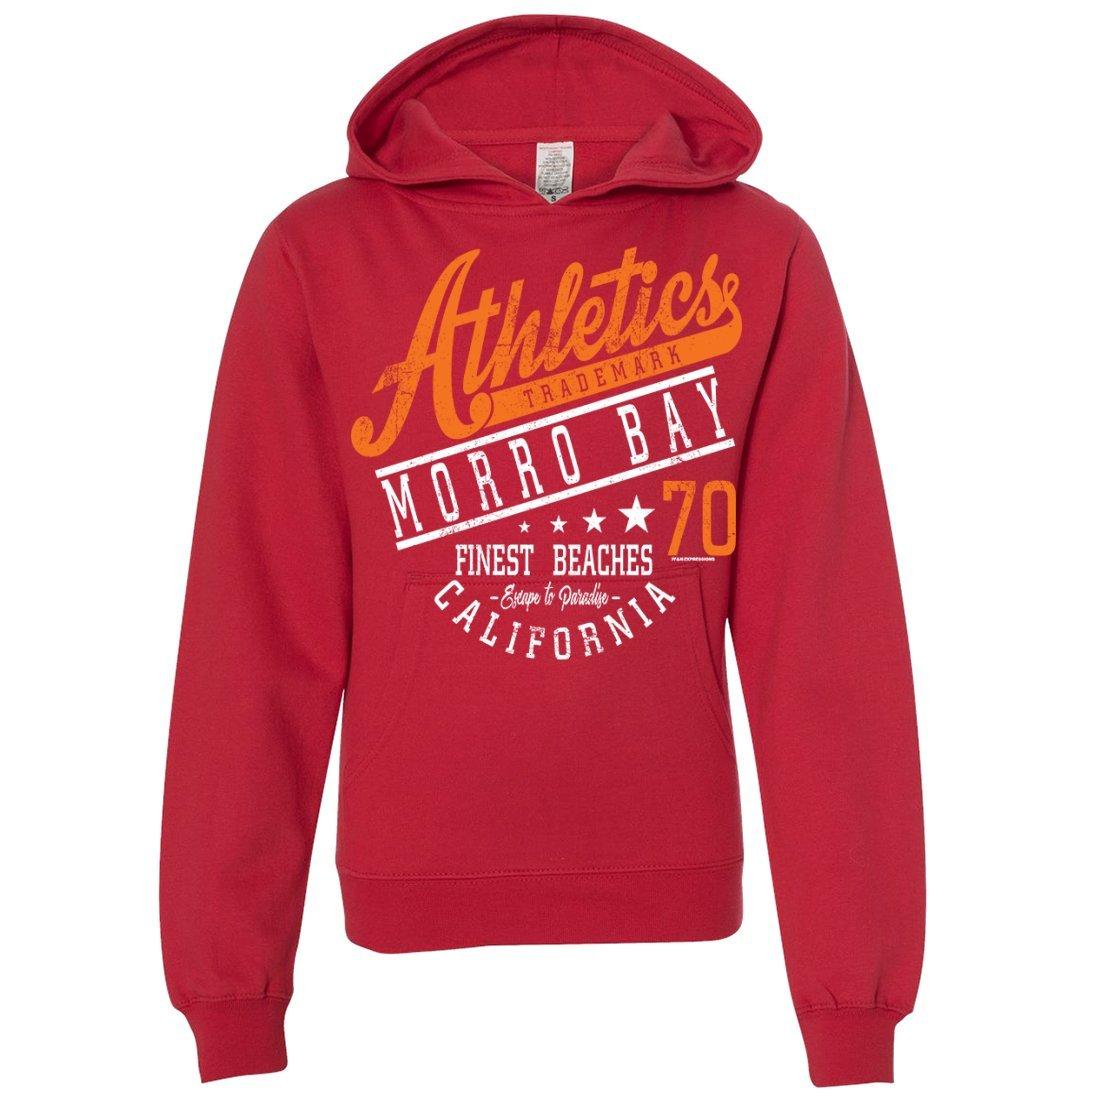 Morro Bay Athletics Premium Youth Sweatshirt Hoodie